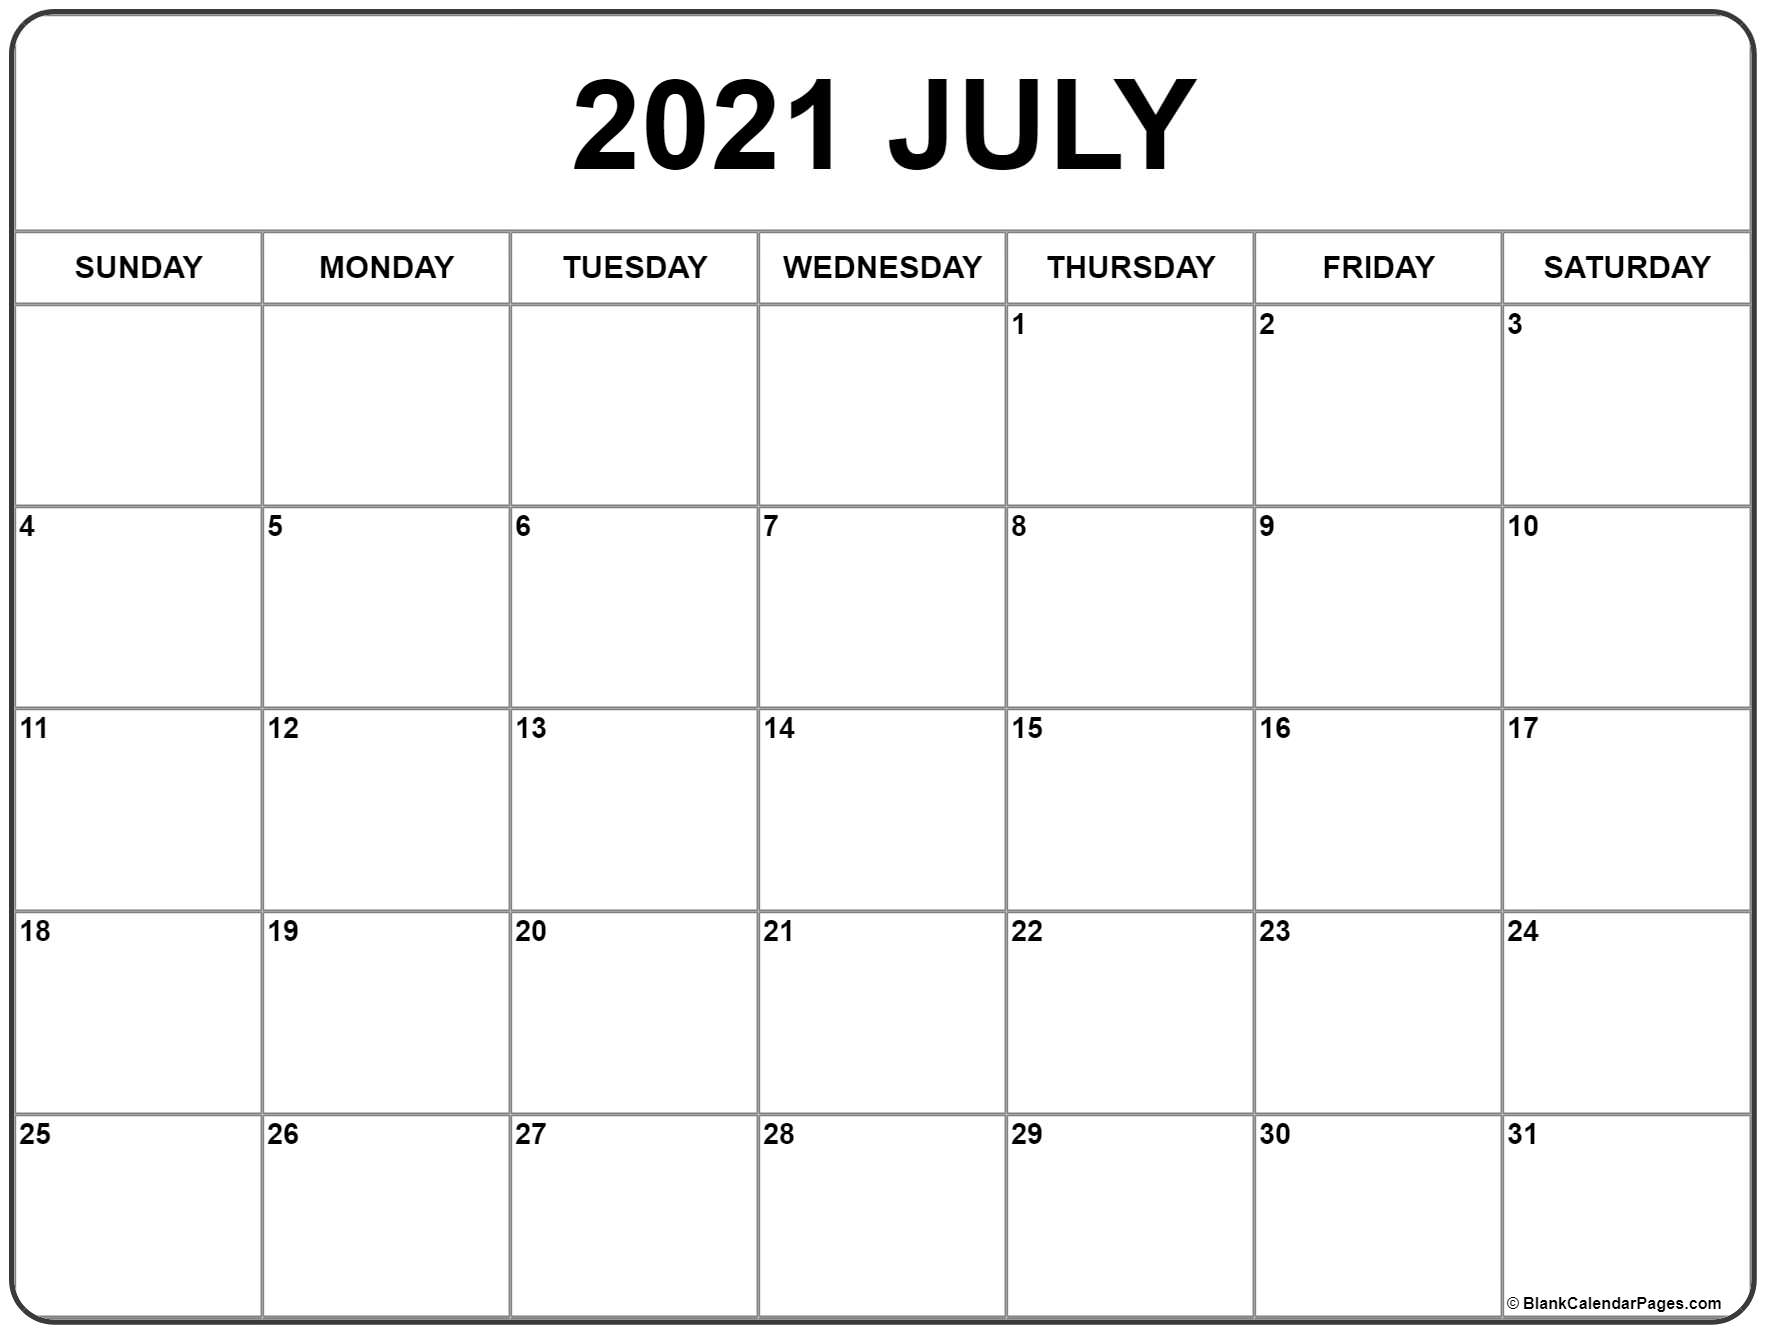 Get 2021 Calendar Printable Free